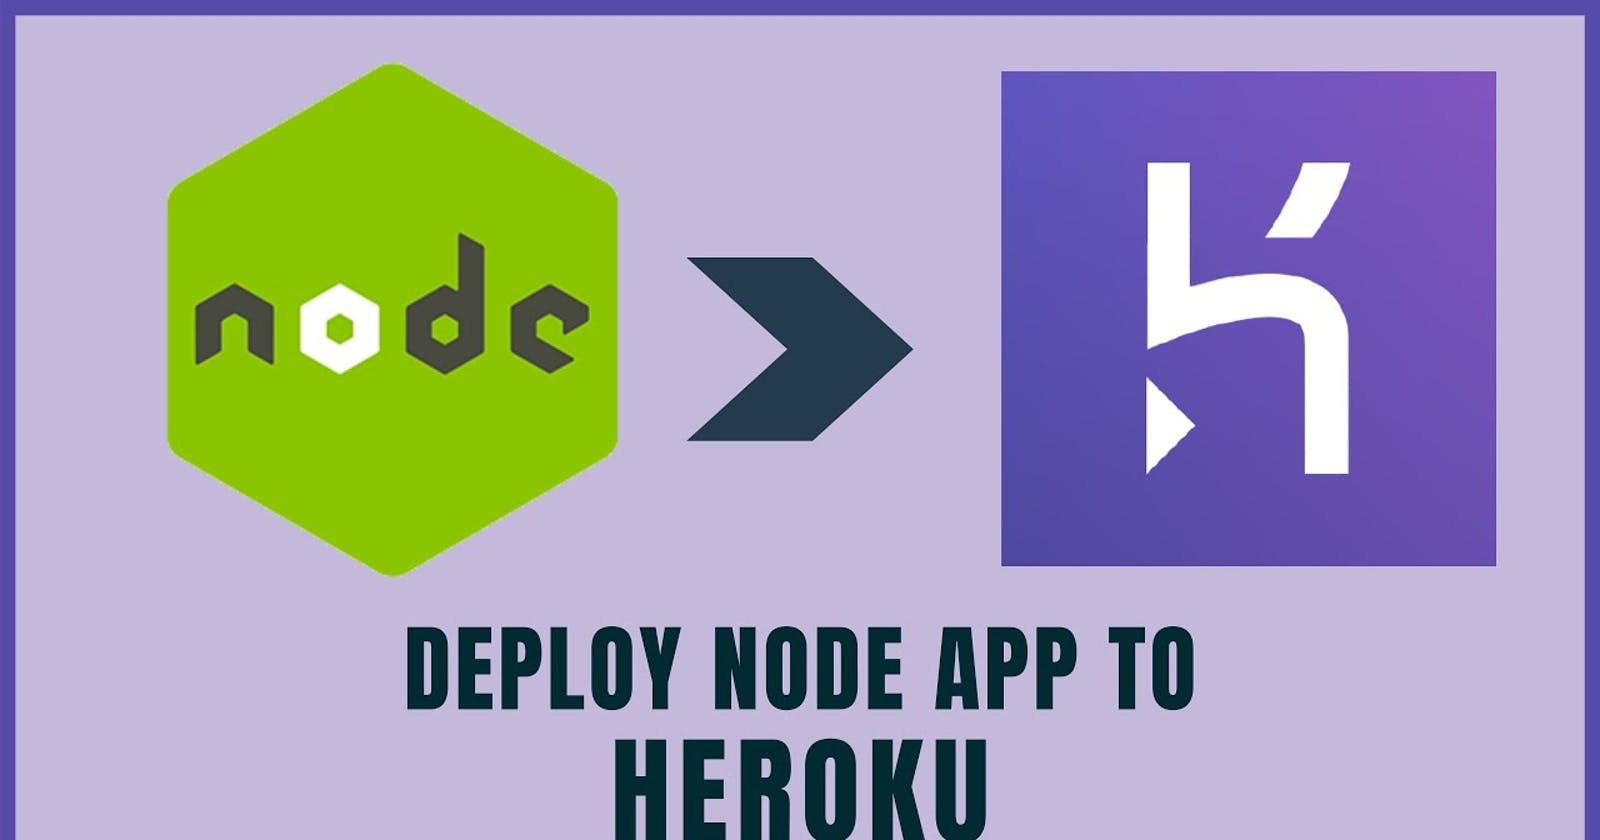 Hosting NodeJs Application on Heroku Platform using Heroku CLI